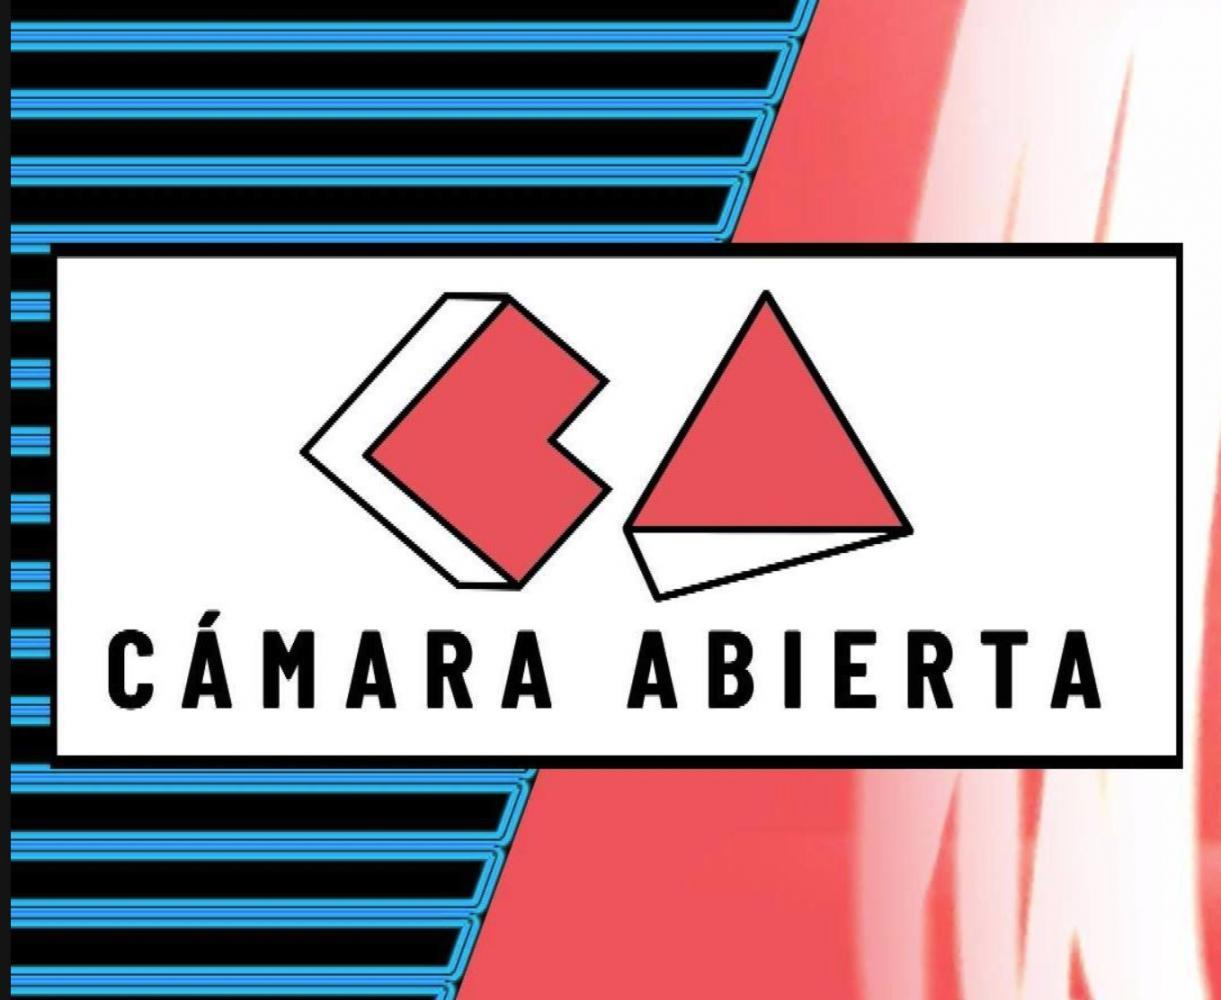 Photography image - Loading Camara_abierta.jpg